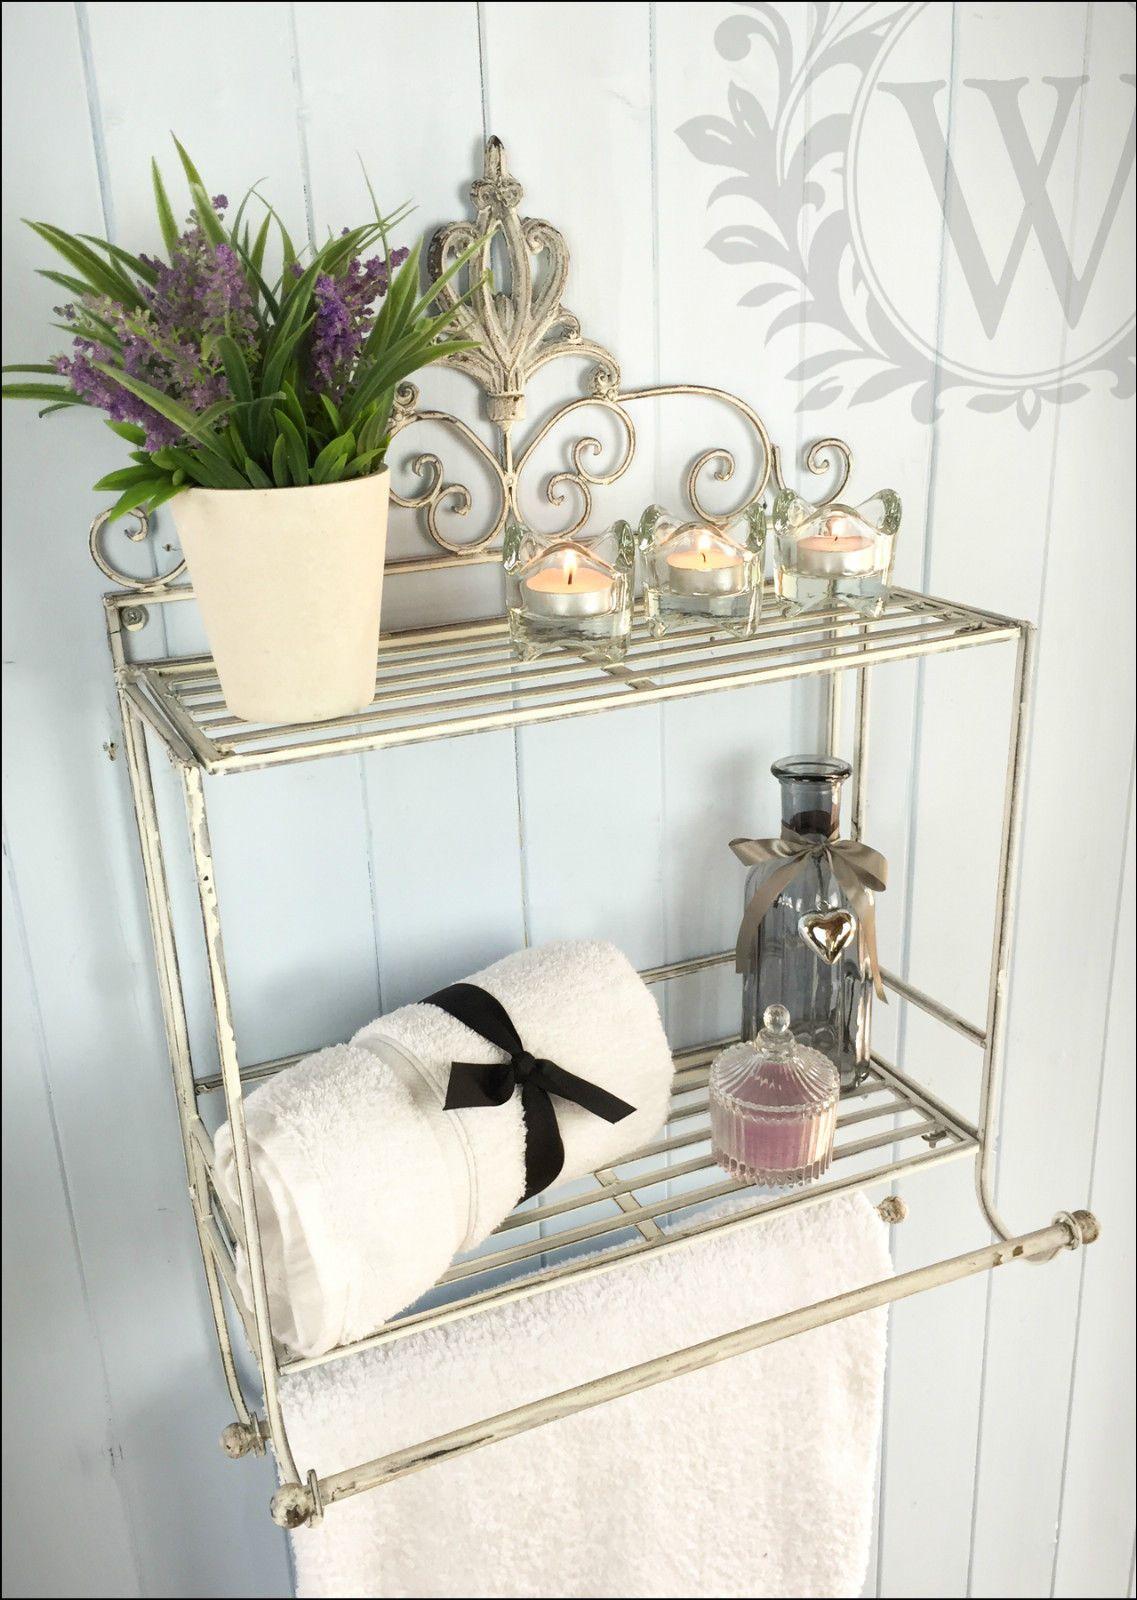 Shabby Chic Metal Scroll Shelf Hanging Storage Towel Rail Cream Unit ...